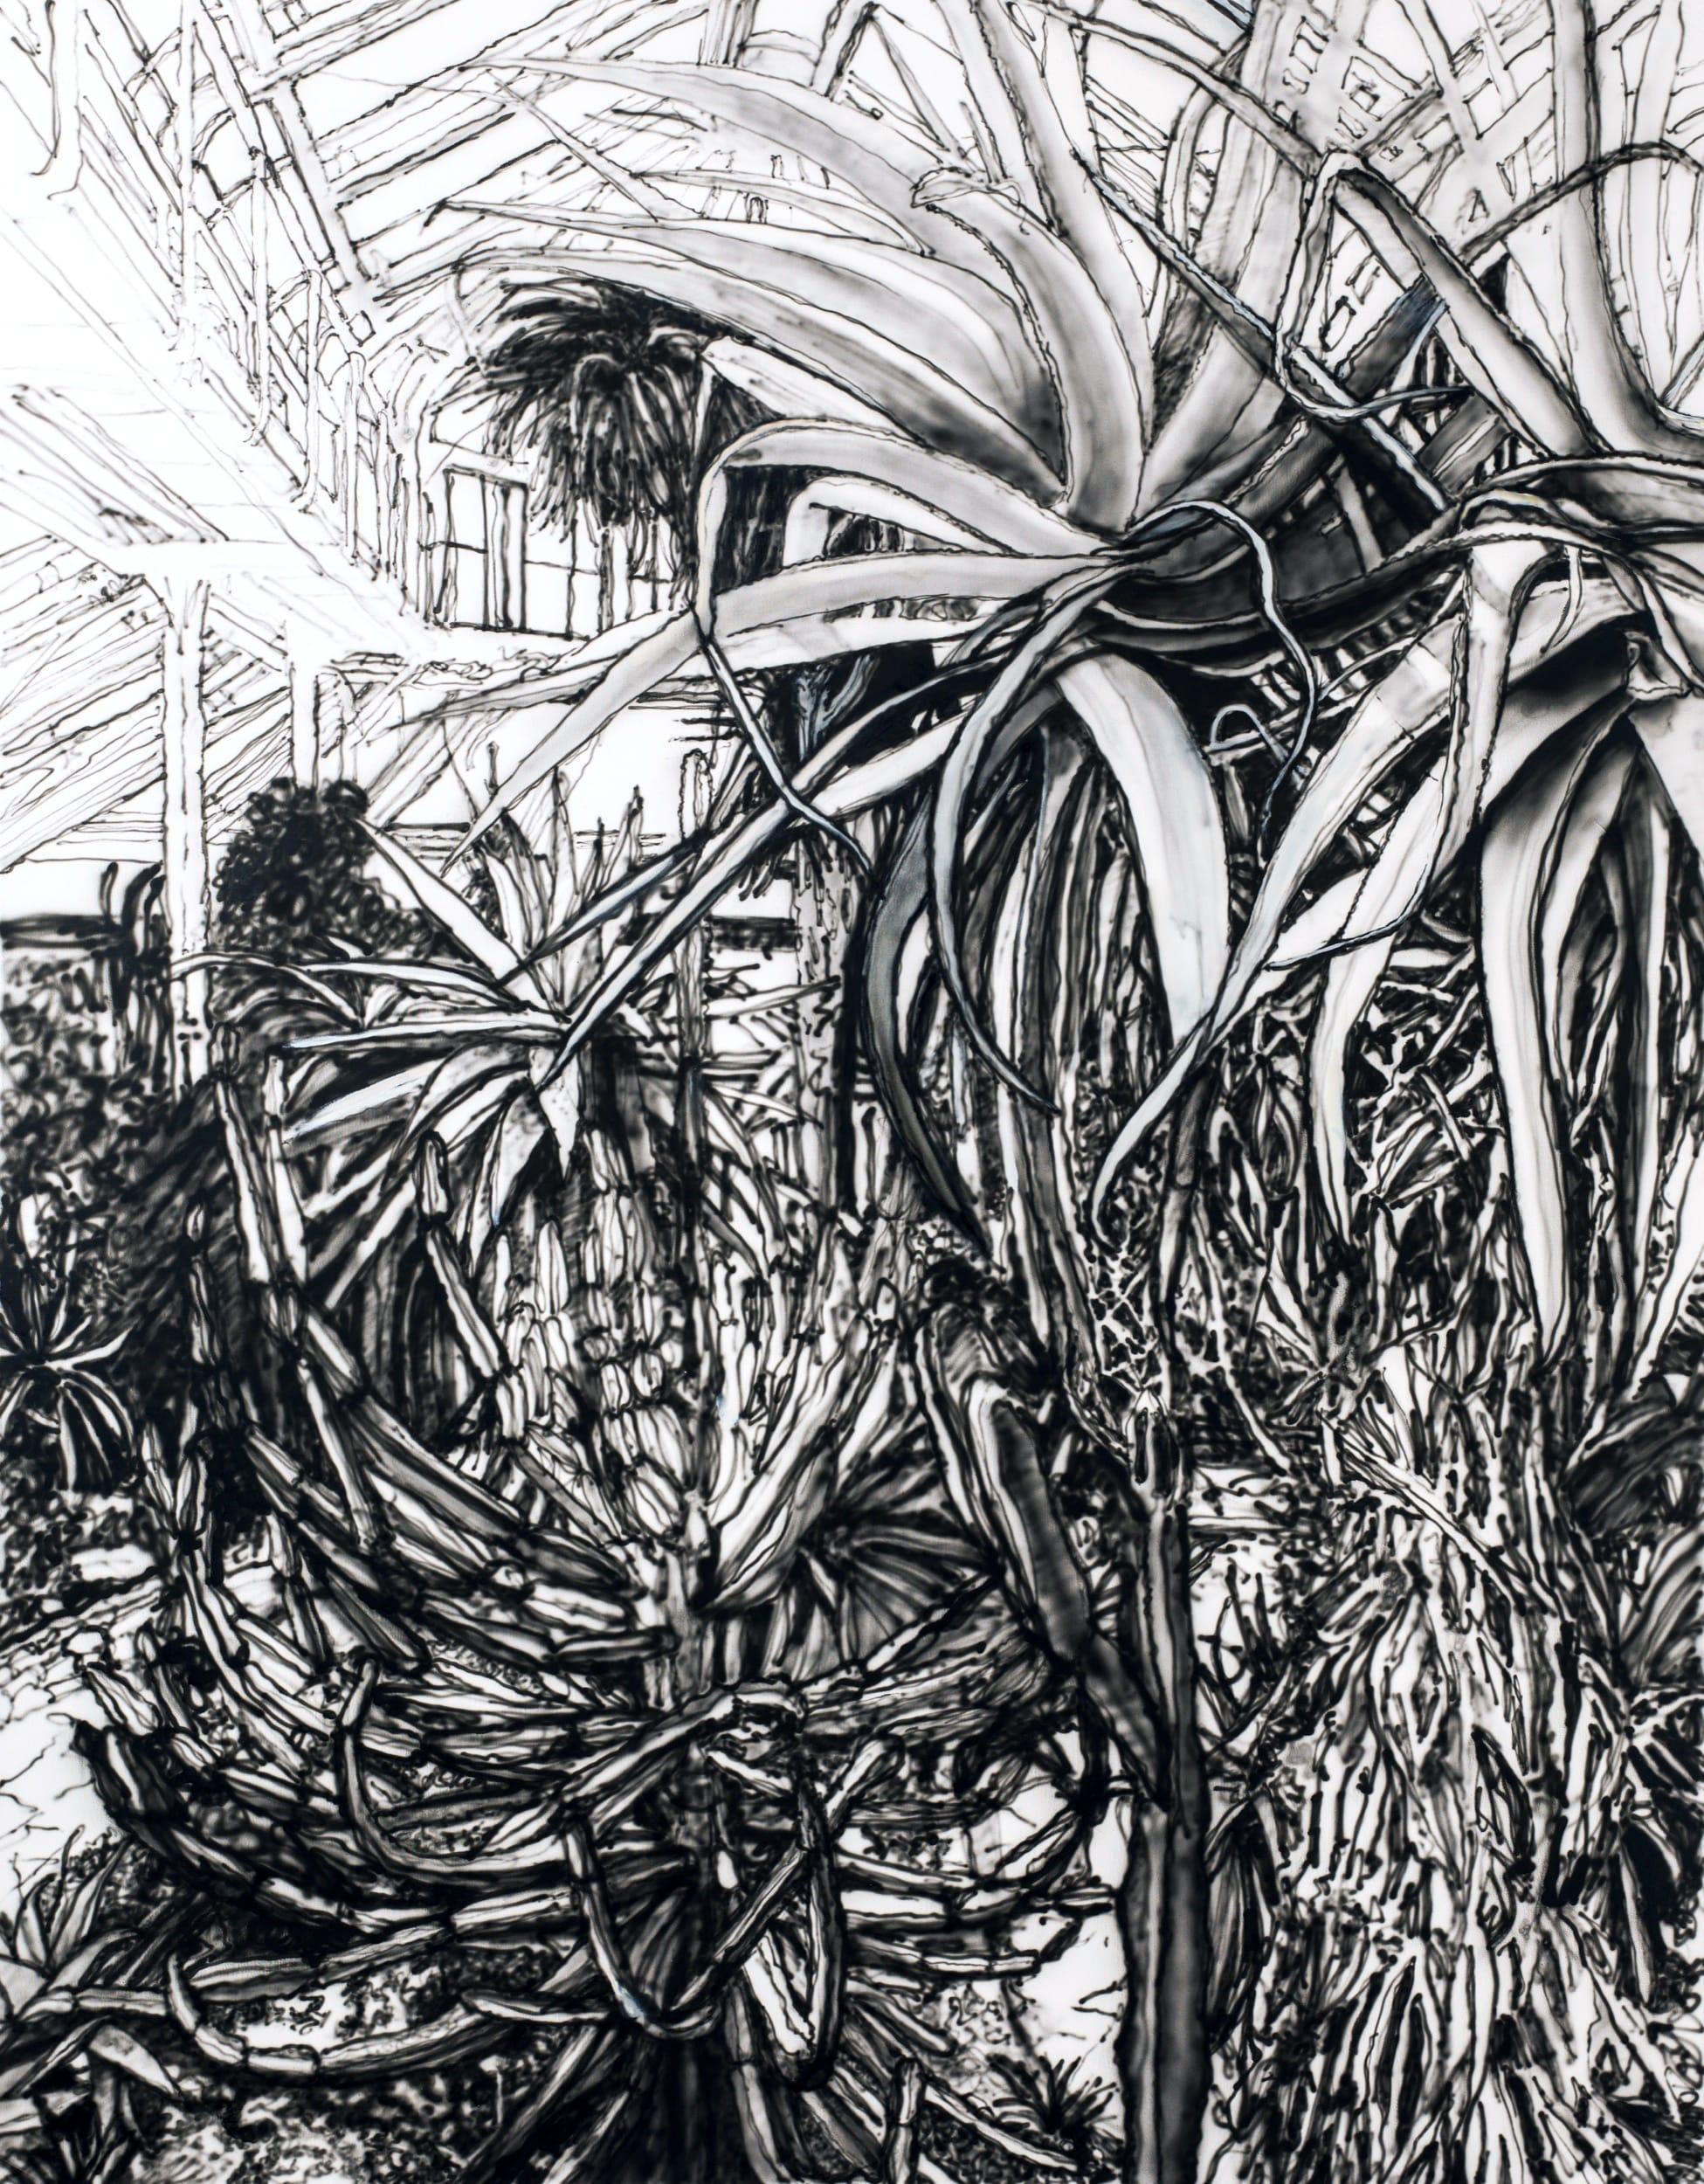 Palme. Oil on canvas, 110 x 140 cm, 2019